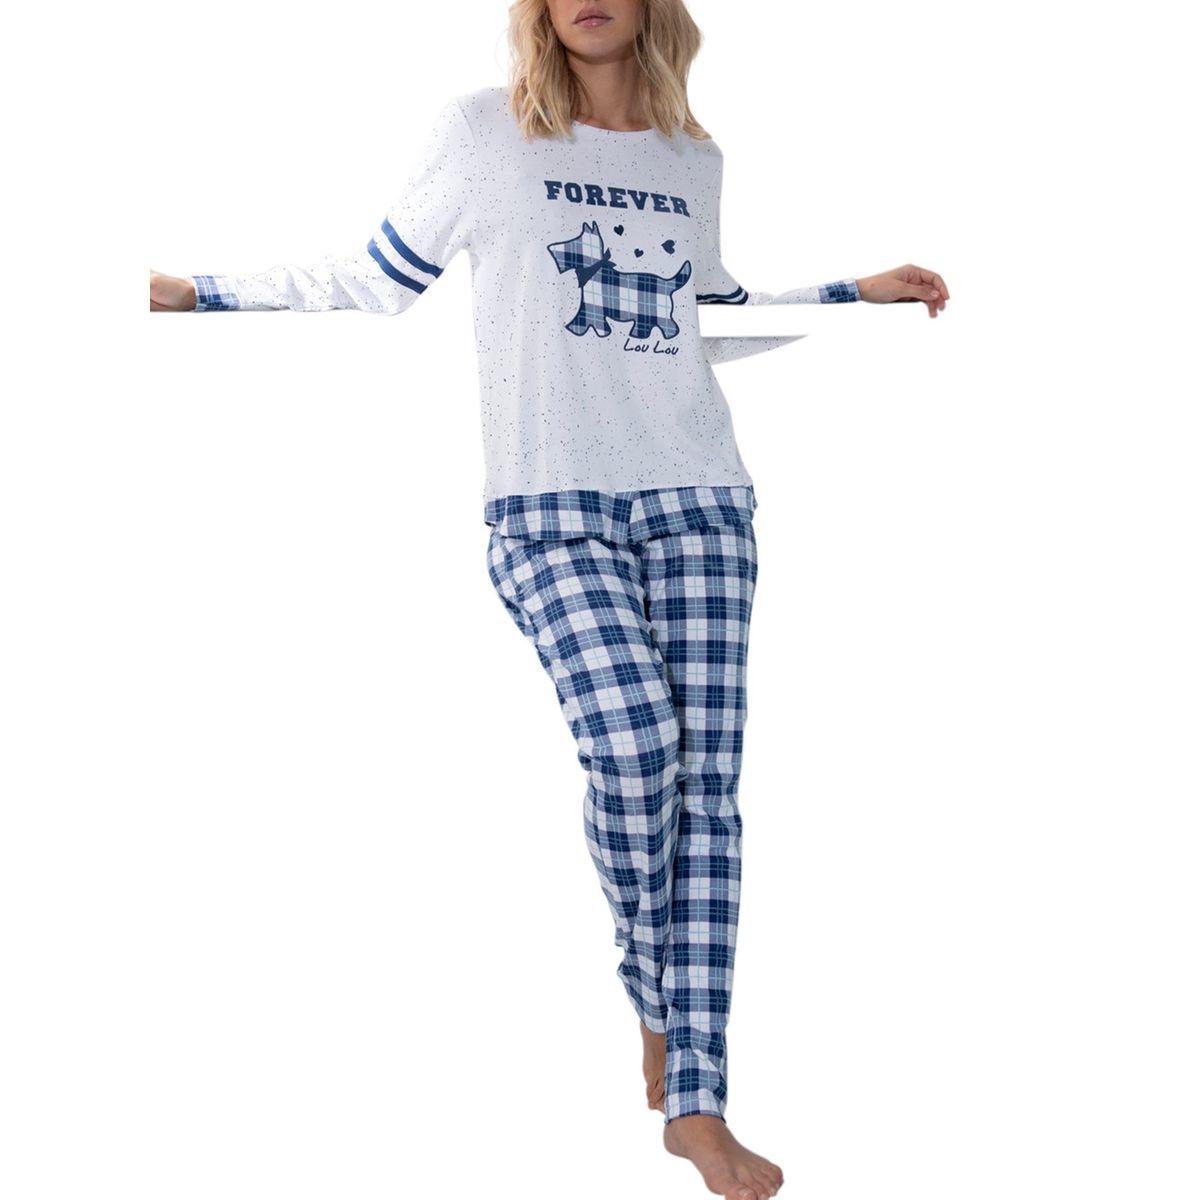 Pyjama pantalon manches longues Lou Lou Winter